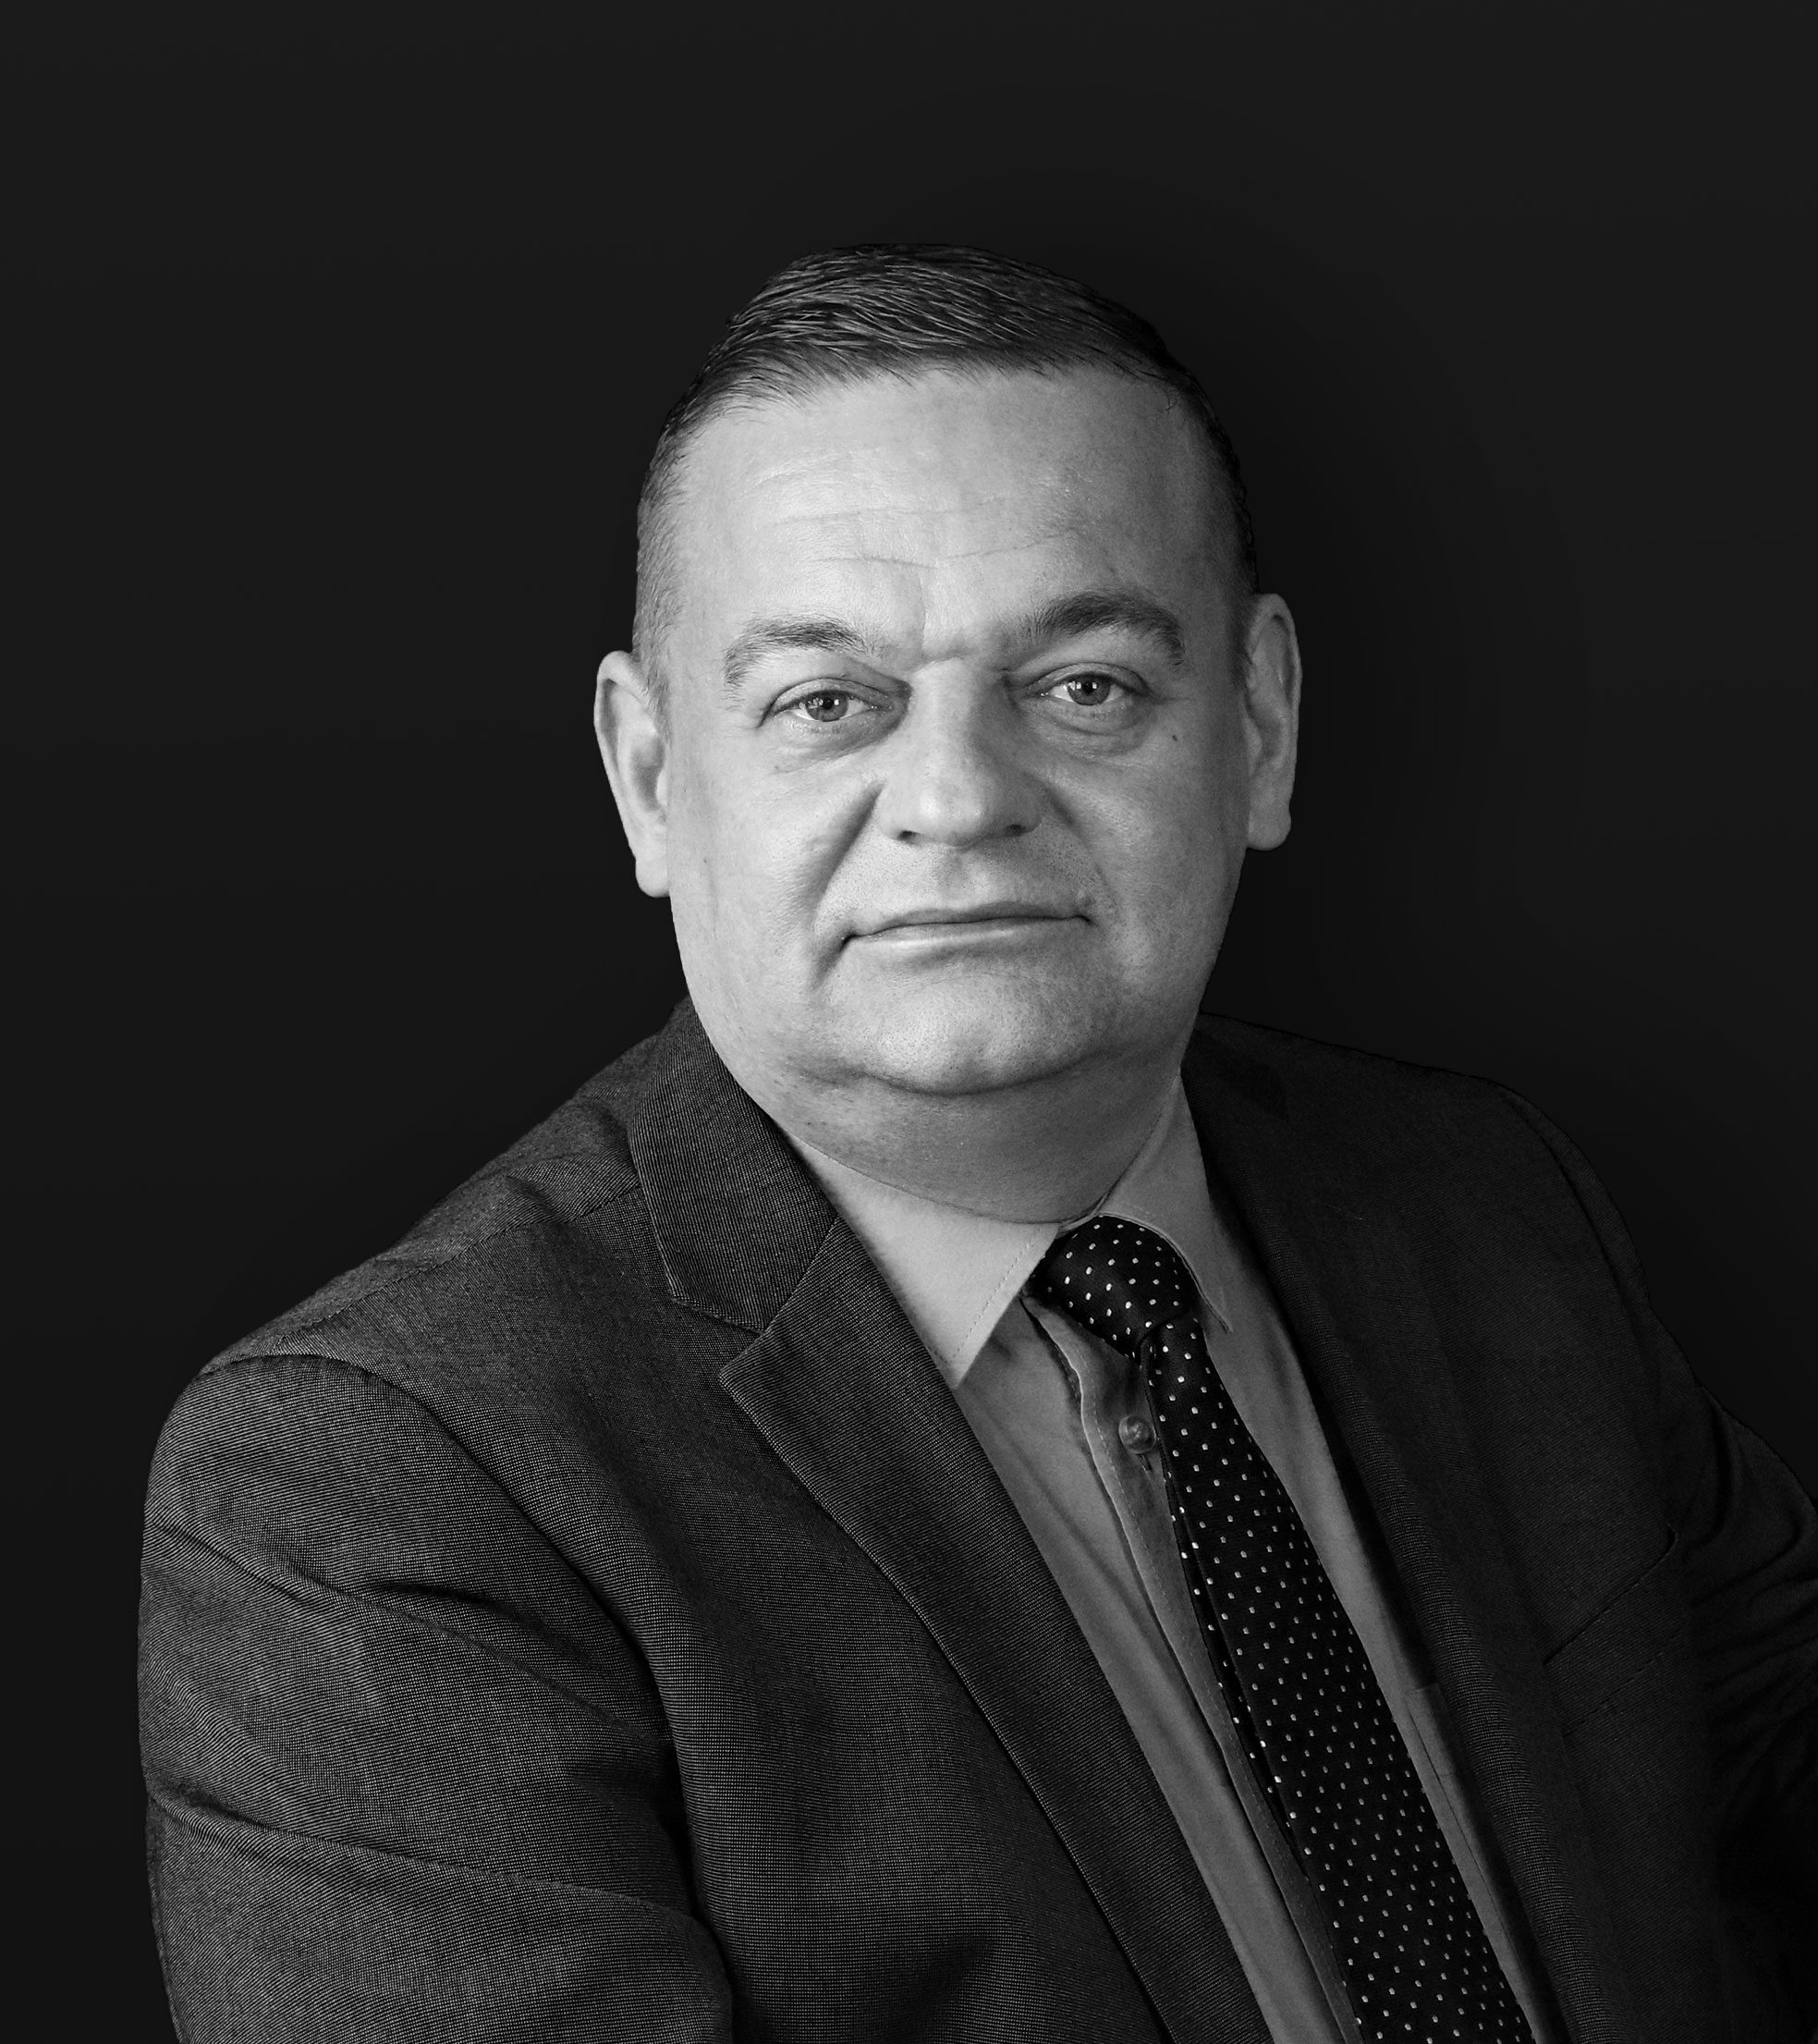 Adrian-Cieslake-WEB-2